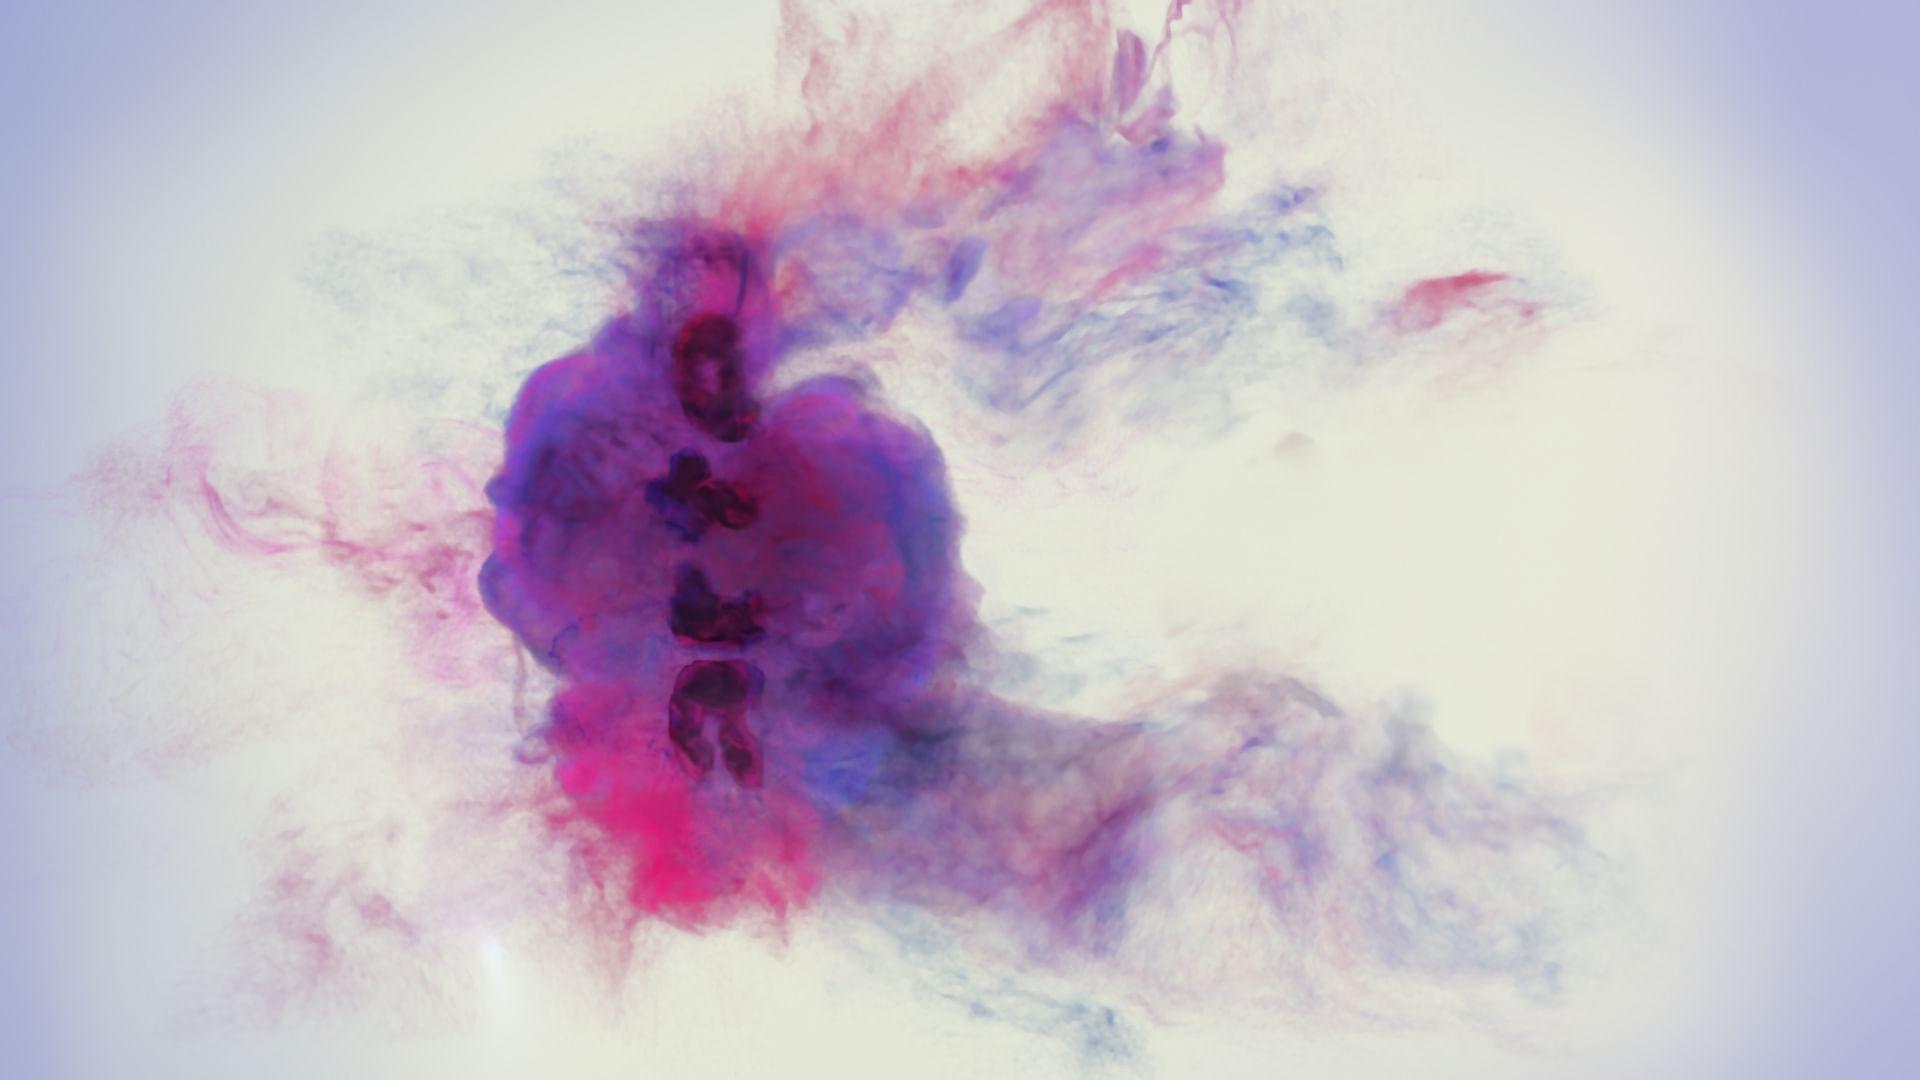 Speedy Graphito: Street Art vs Siebdruck